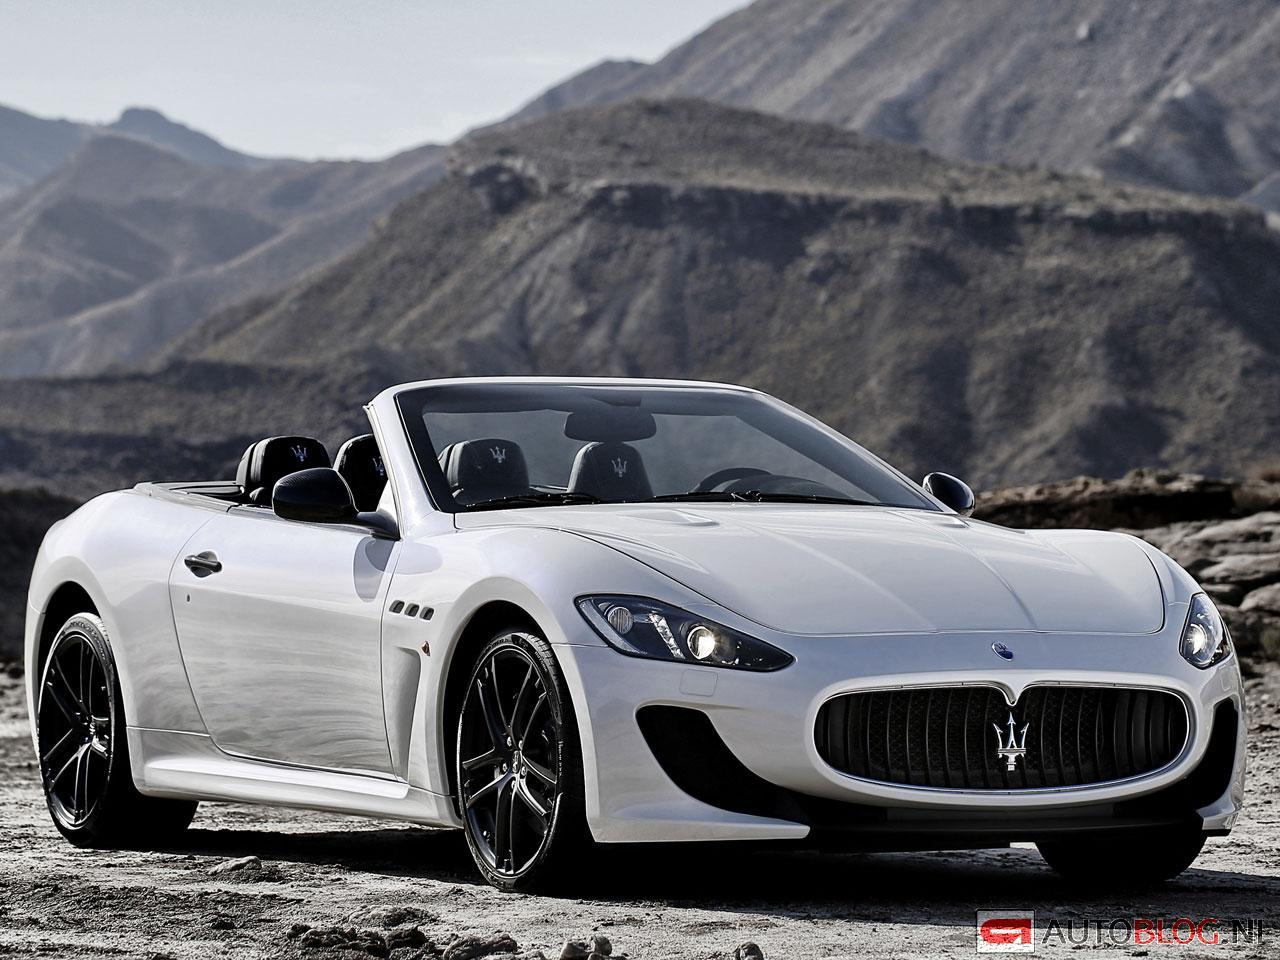 Bien connu Maserati Wallpapers | Widescreen Desktop Backgrounds AU93